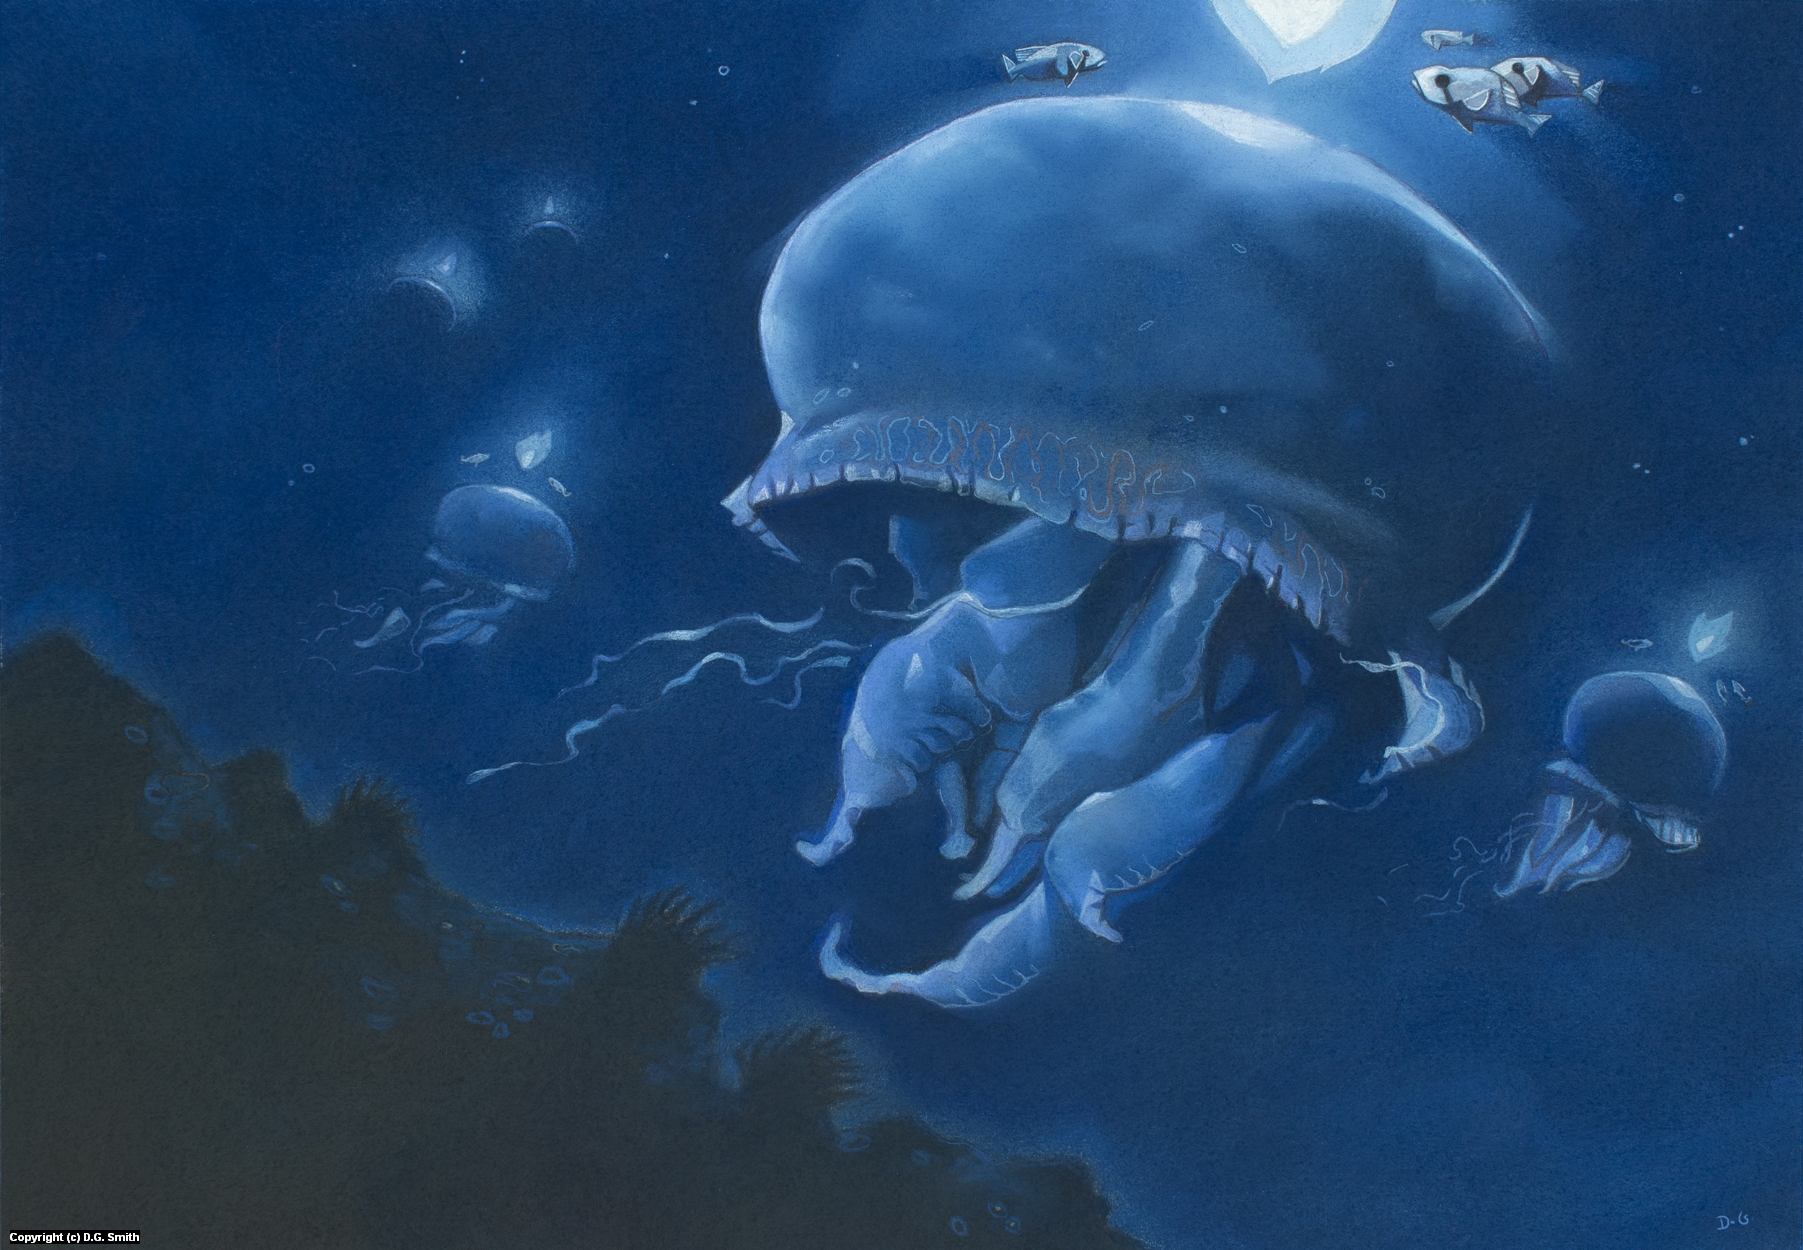 Blue Lantern Bearers Artwork by D.G. Smith